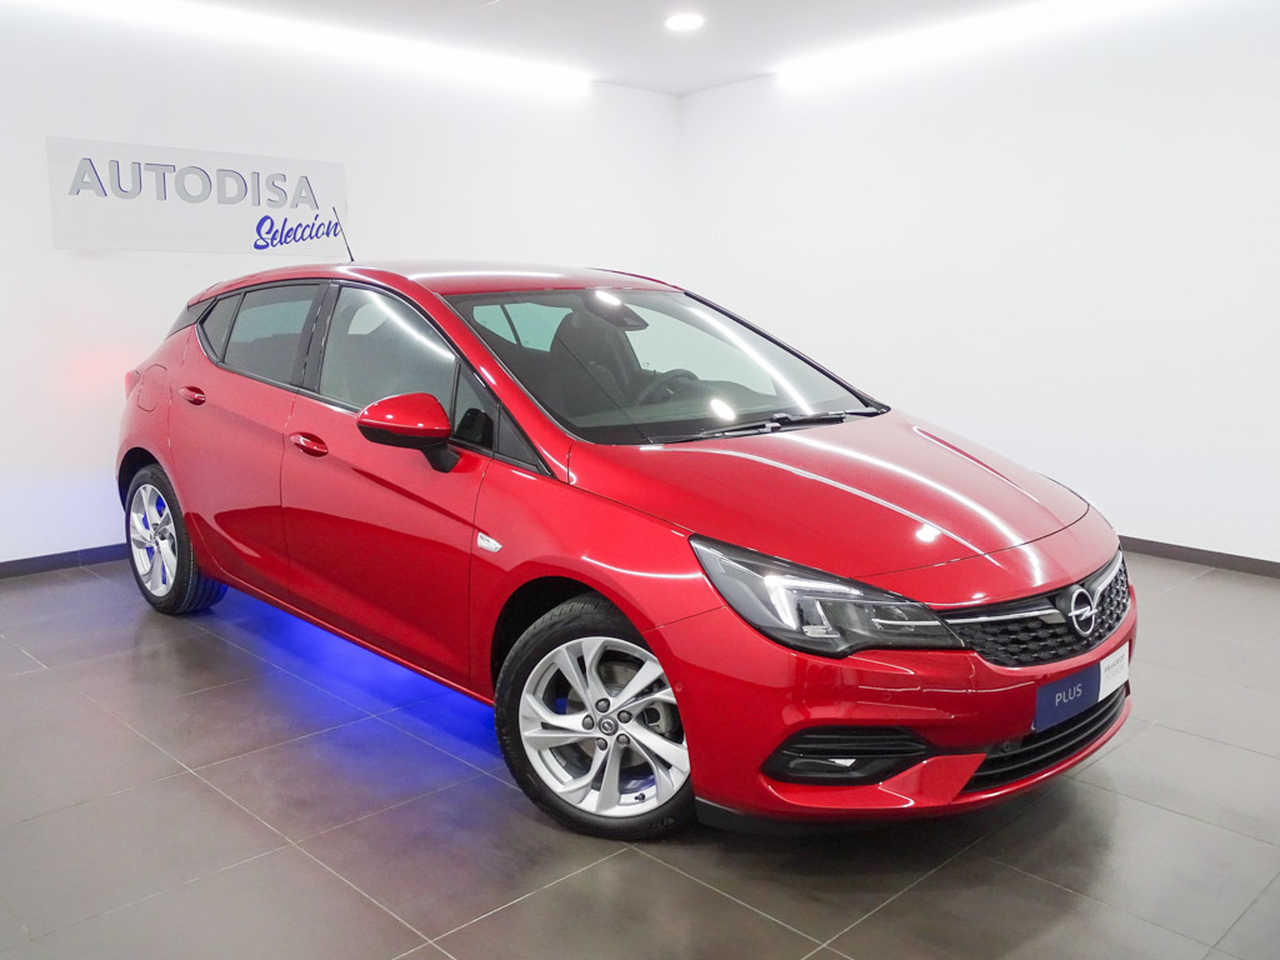 Array Opel Astra 2021 Diésel por 17.495€ en Valencia